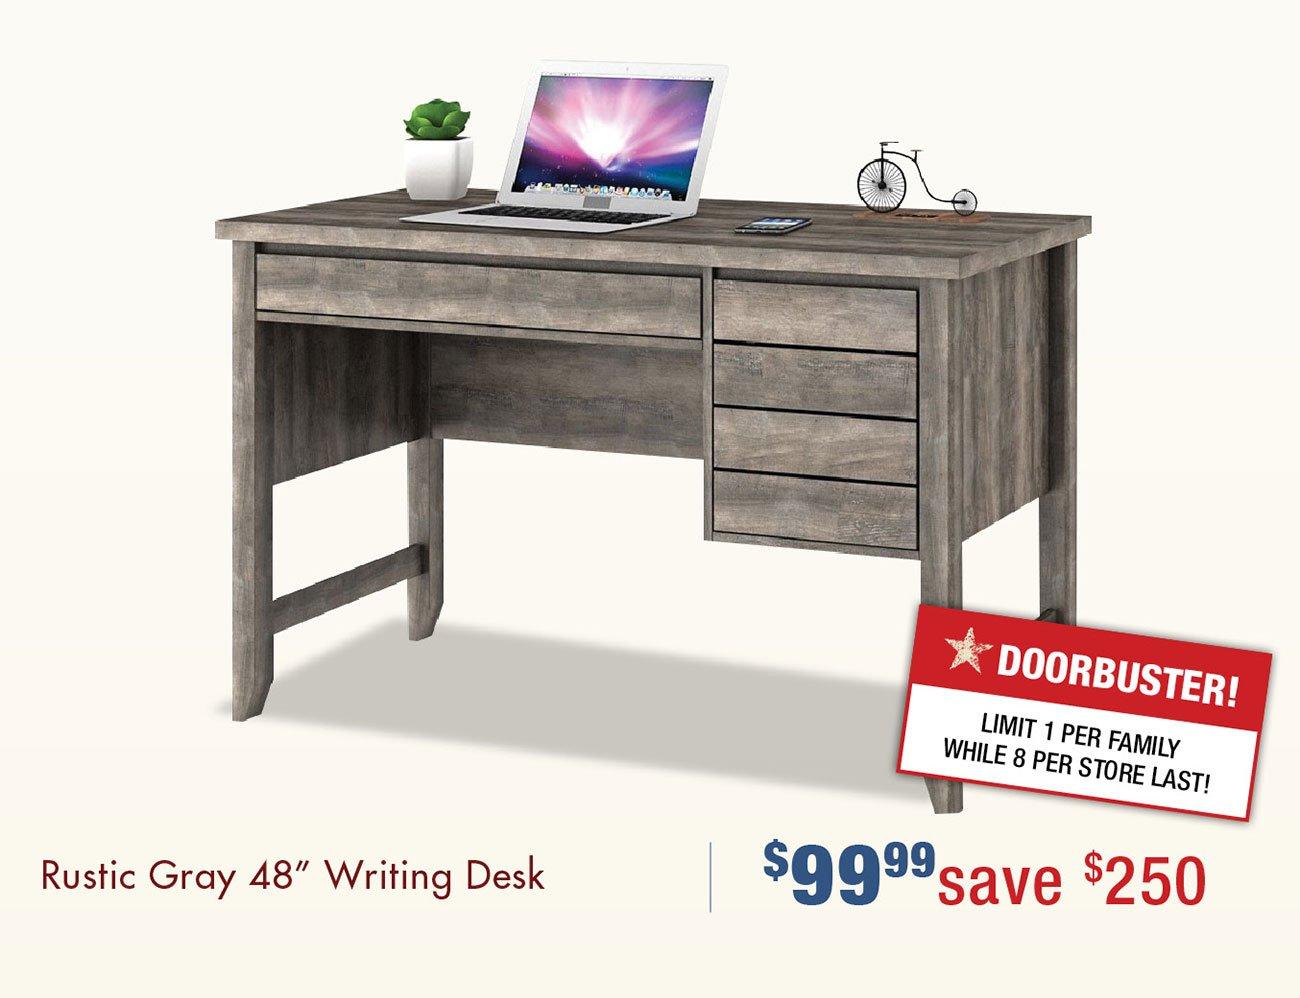 Rustic-gray-writing-desk